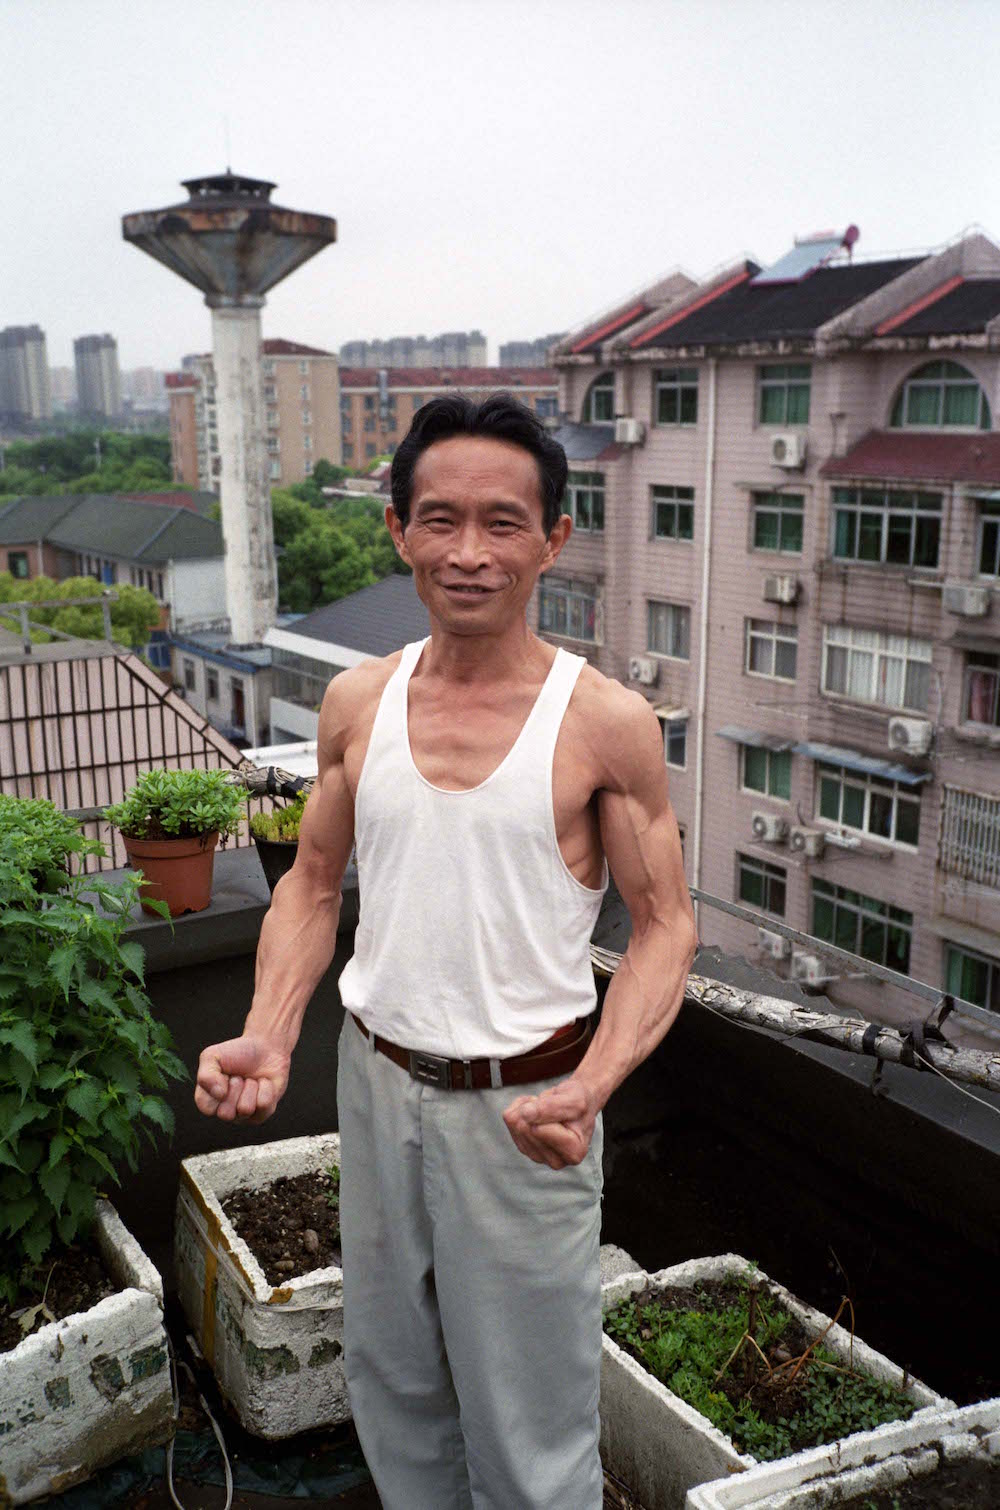 duran-levinson-shanghai-photography-11.jpg